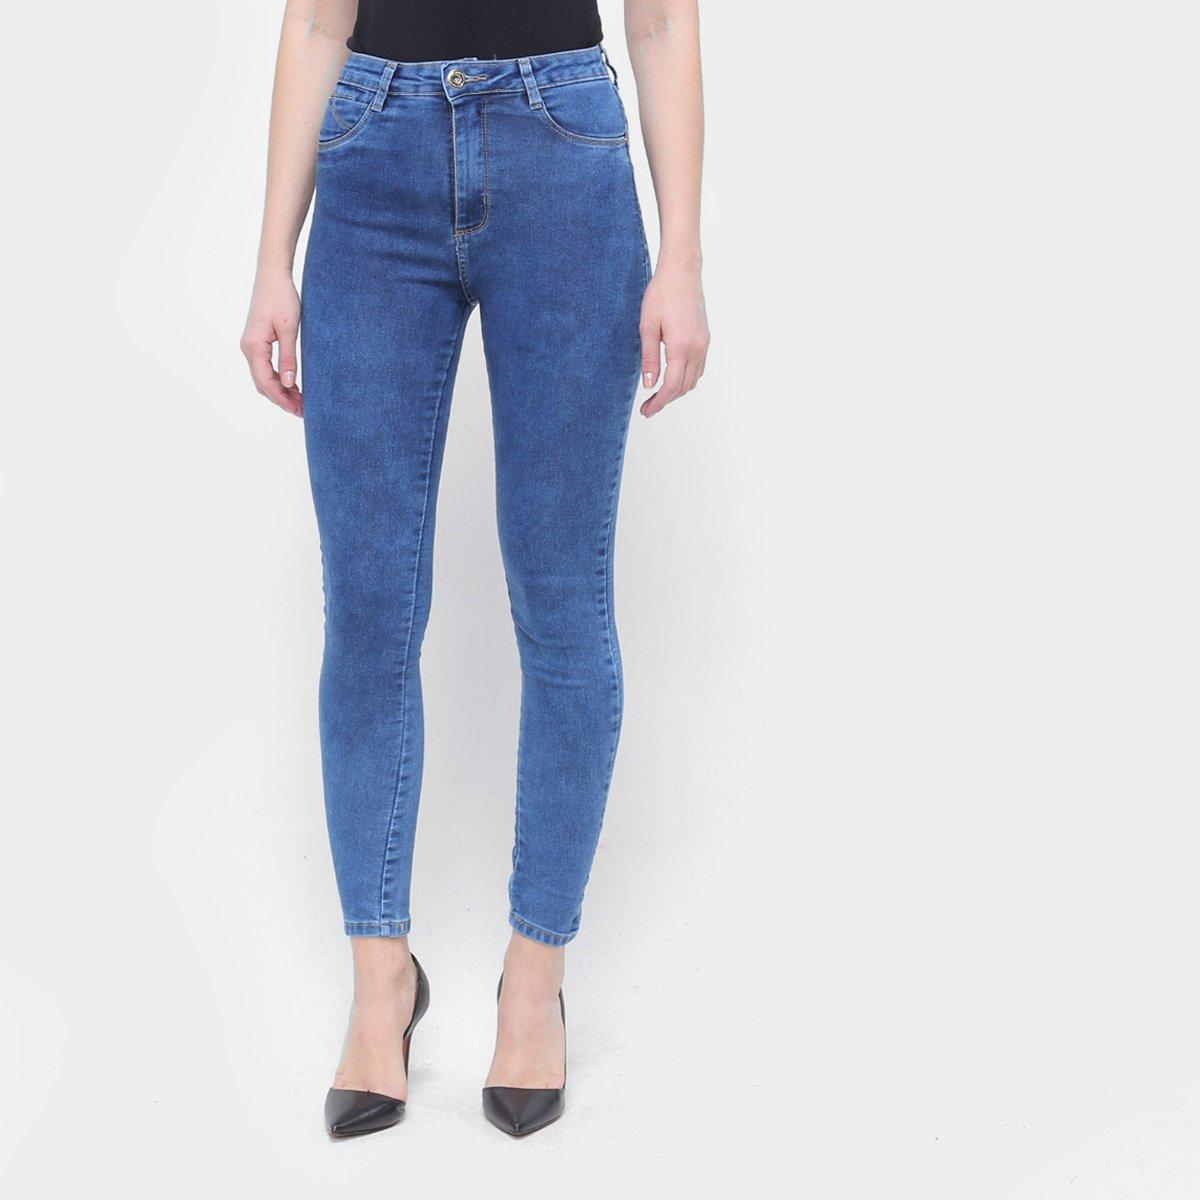 Calça Jeans Sawary Cigarrete Hot Pant Push Up Feminina